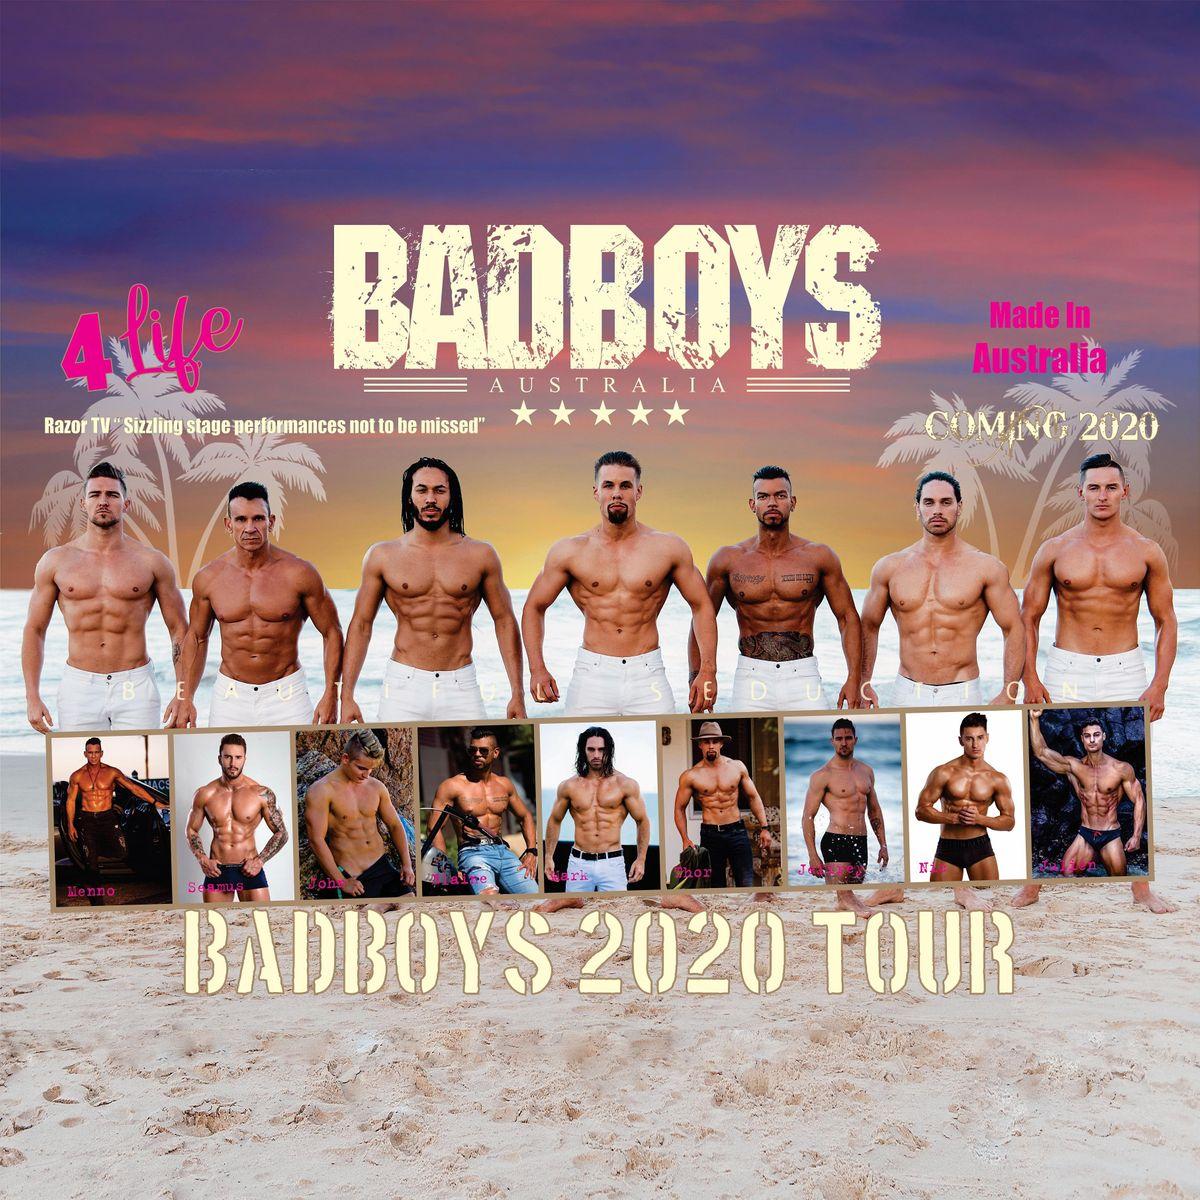 Badboys Australia is BACK by popular demand in Christchurch 2020